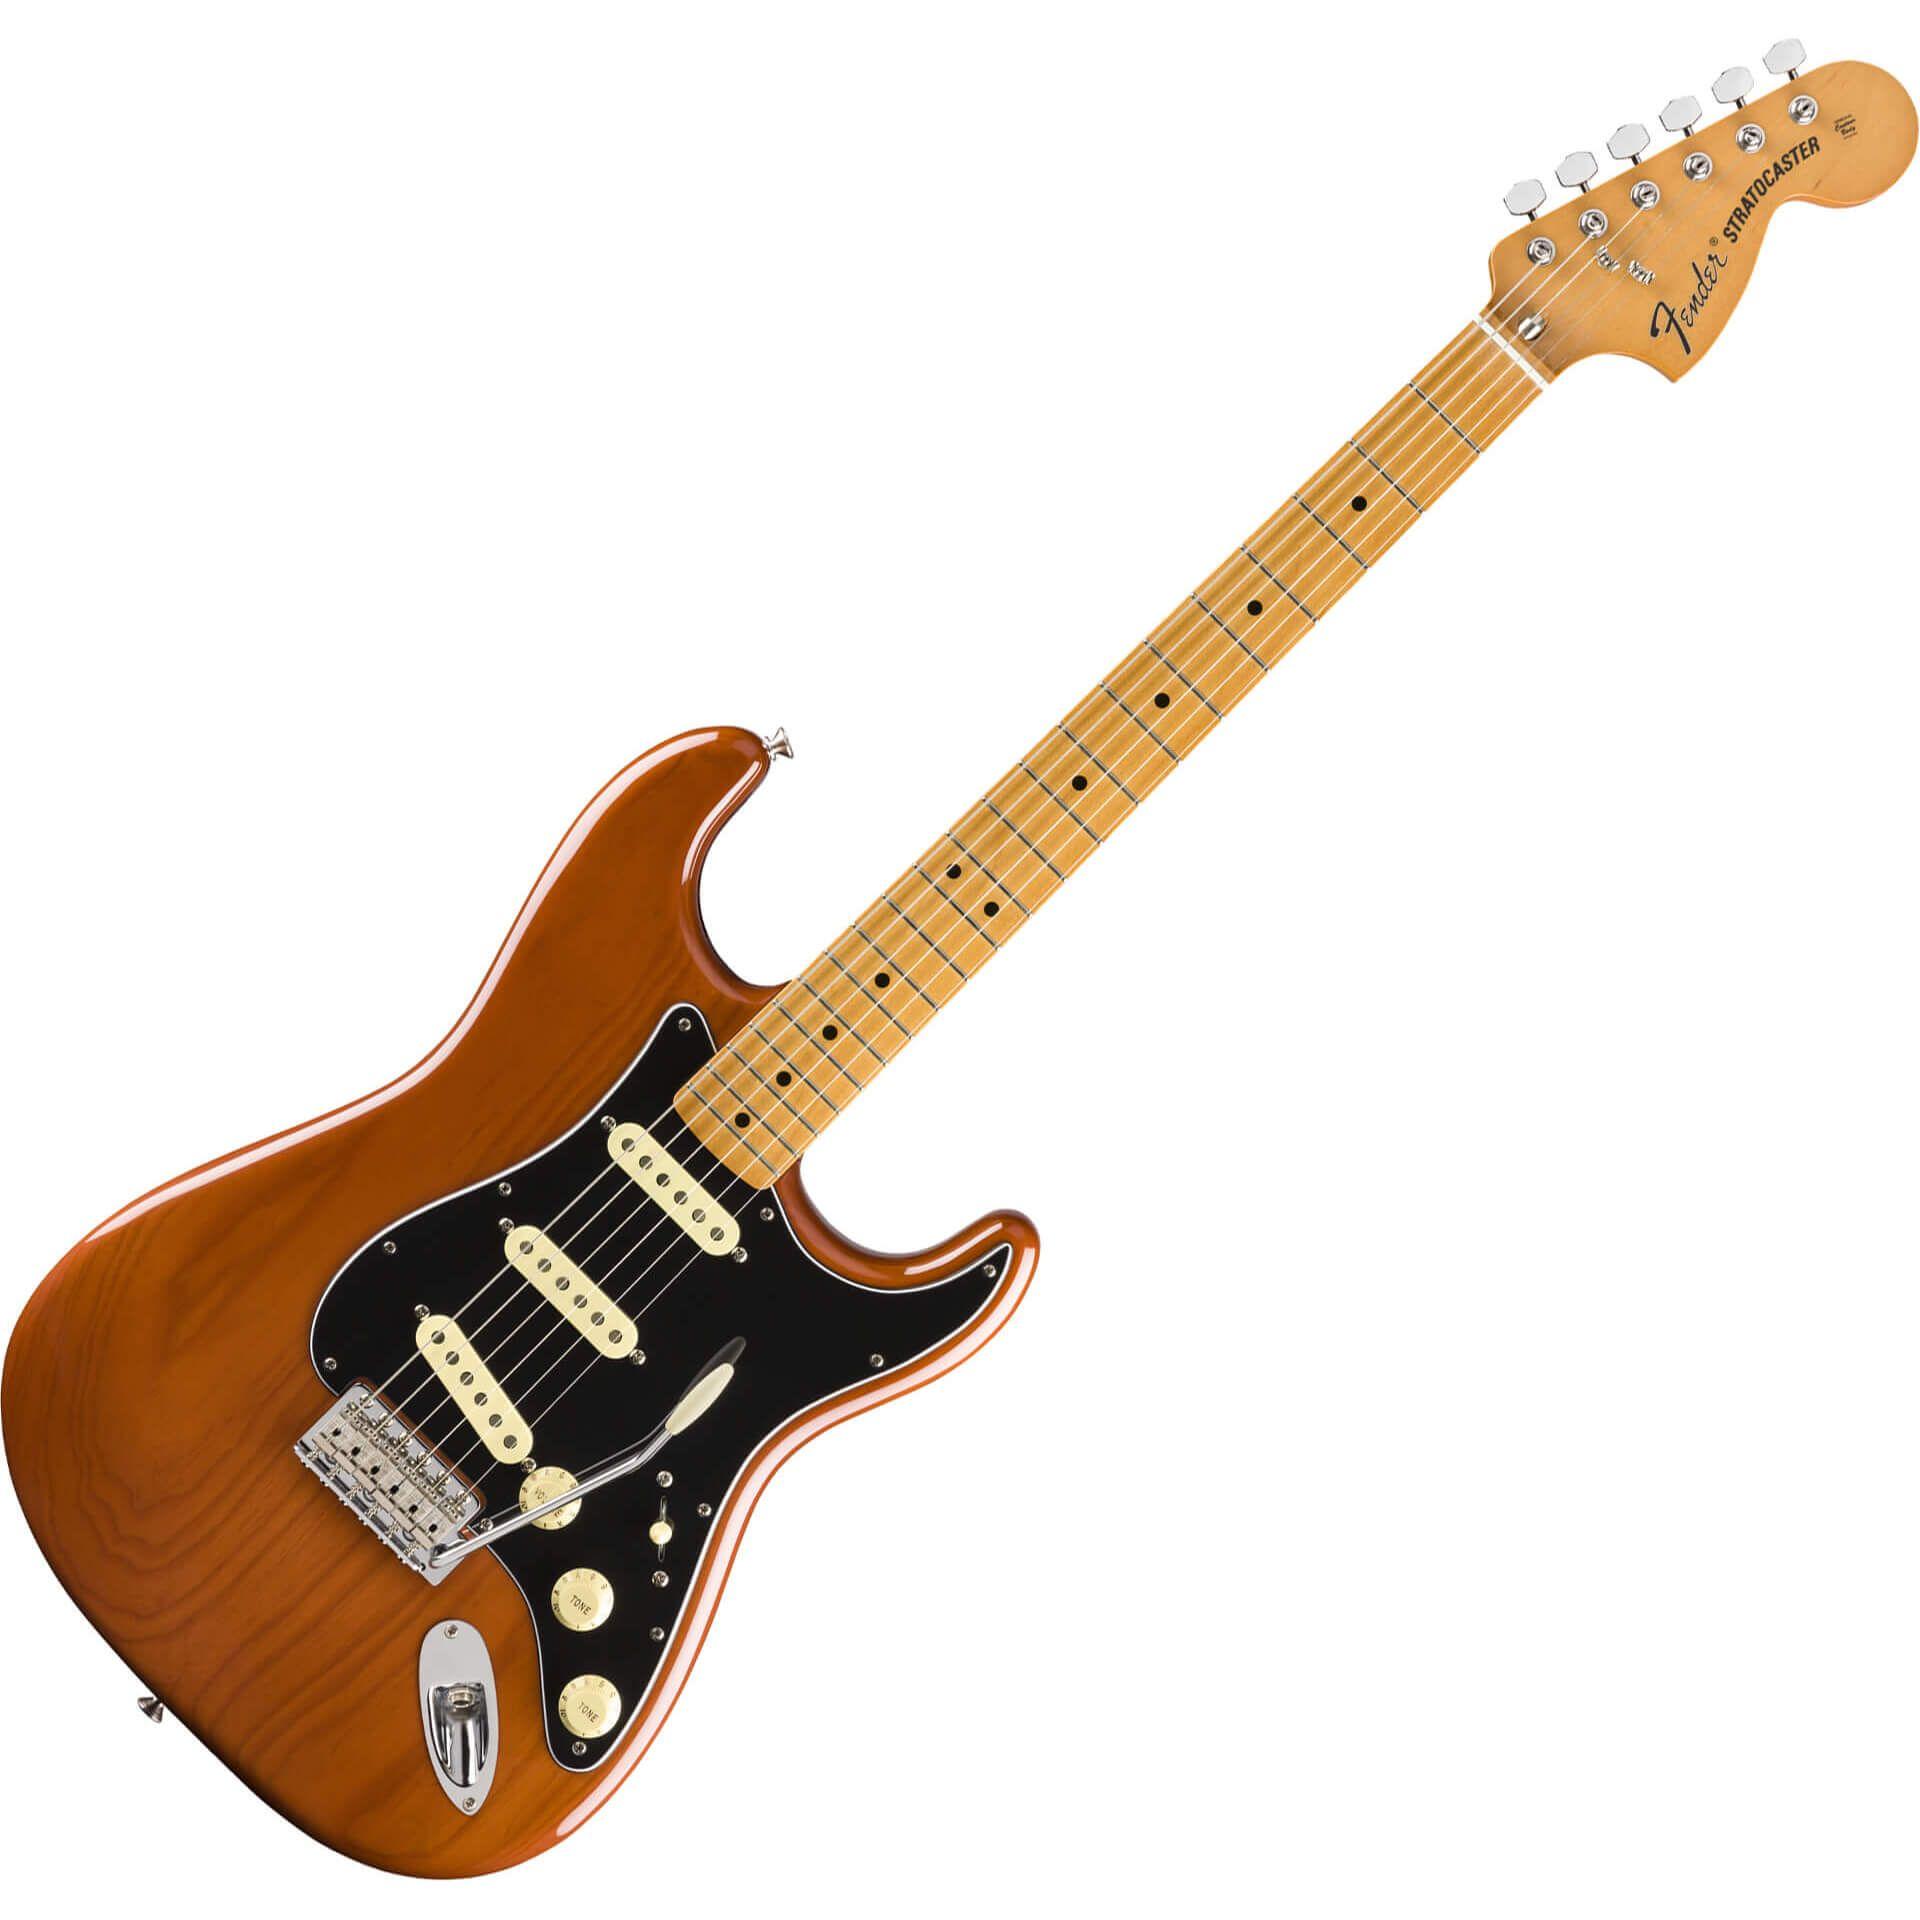 Fender Vintera Series 70s Stratocaster - MN - Mocha